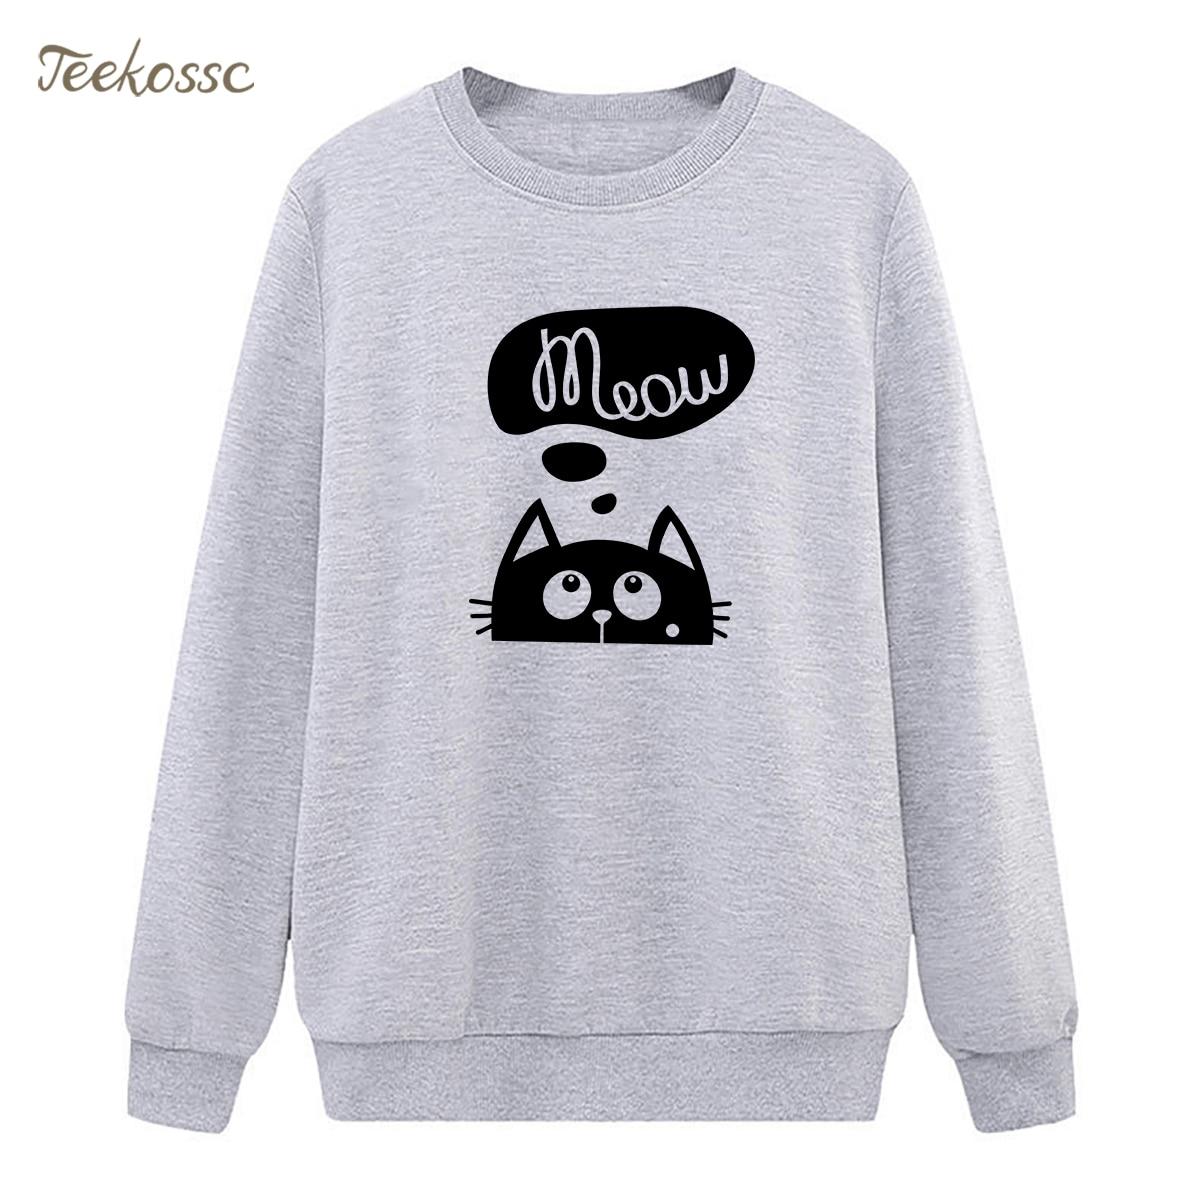 Meow Cat Kawaii Sweatshirt Fuuny Kittyle Hoodie 2018 Hipster Winter Autumn Women Lady Pullover Fleece Loose Animal Streetwear